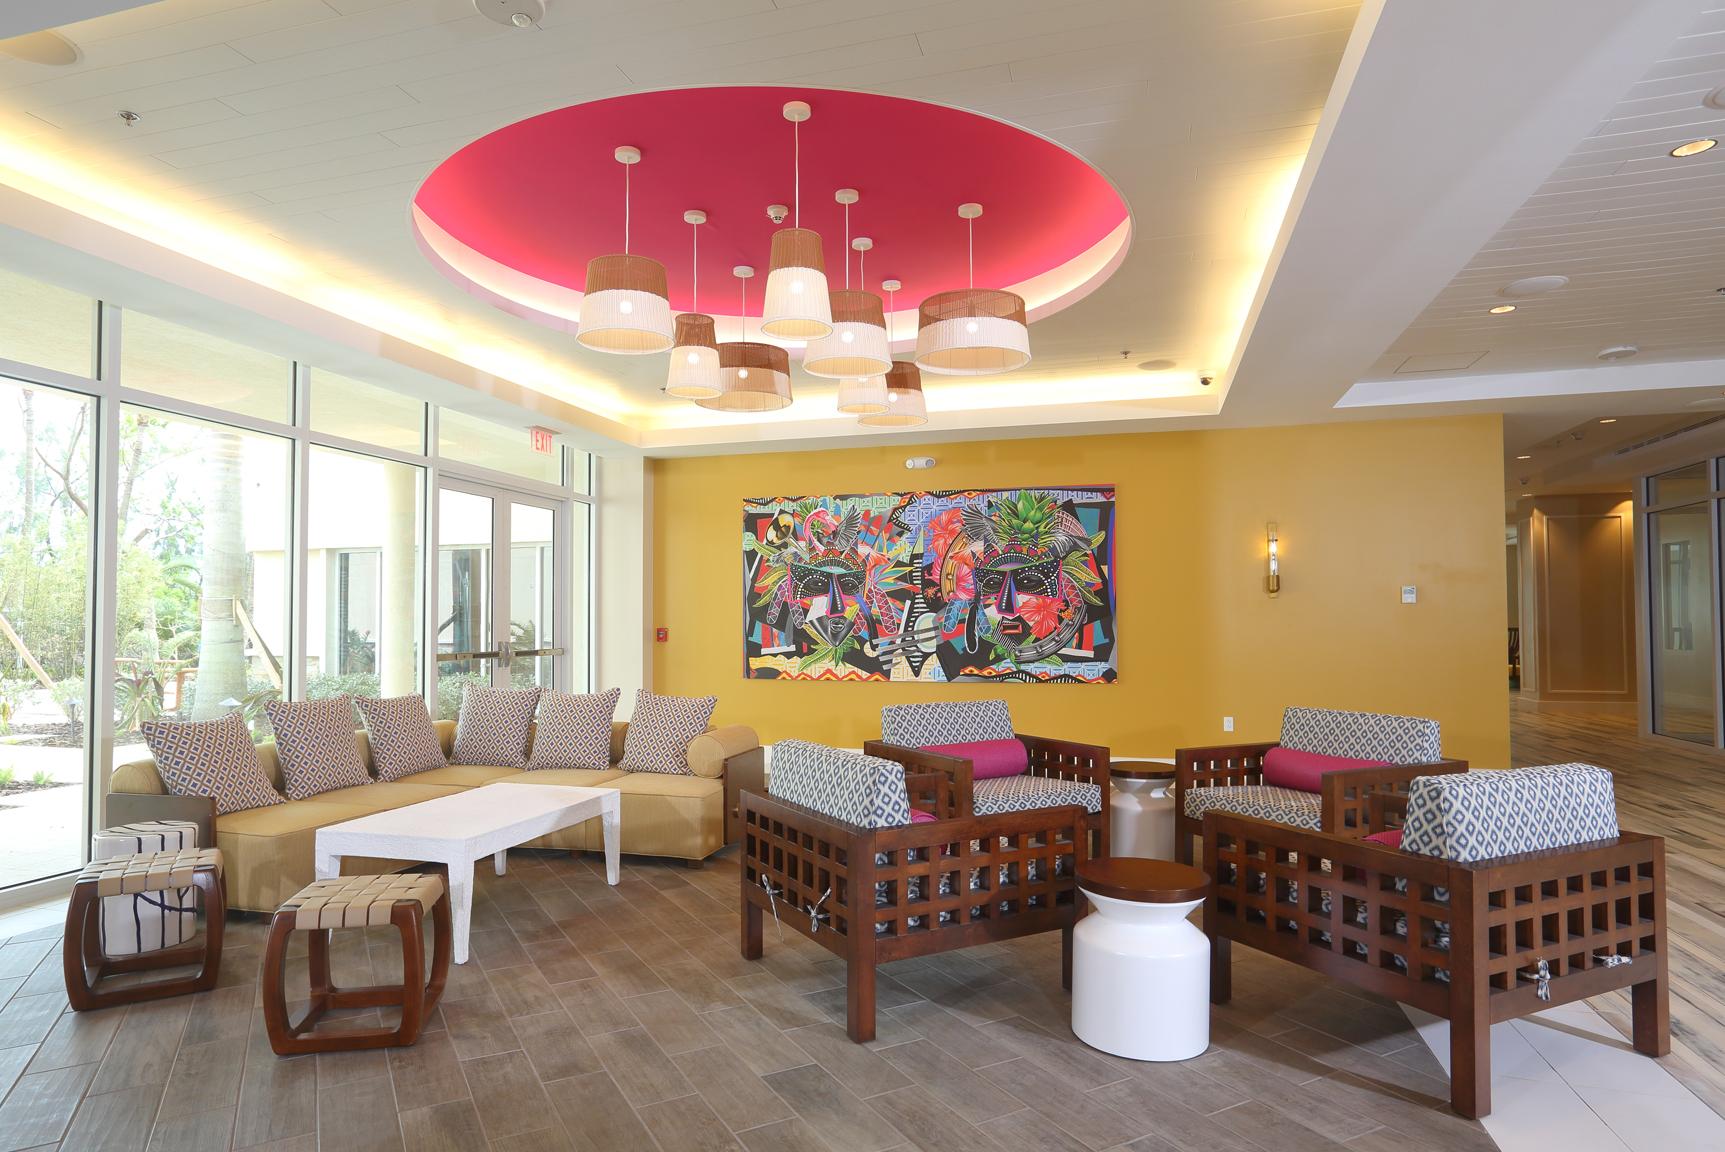 Warwick Paradise Island Bahamas - Sitting area in lobby